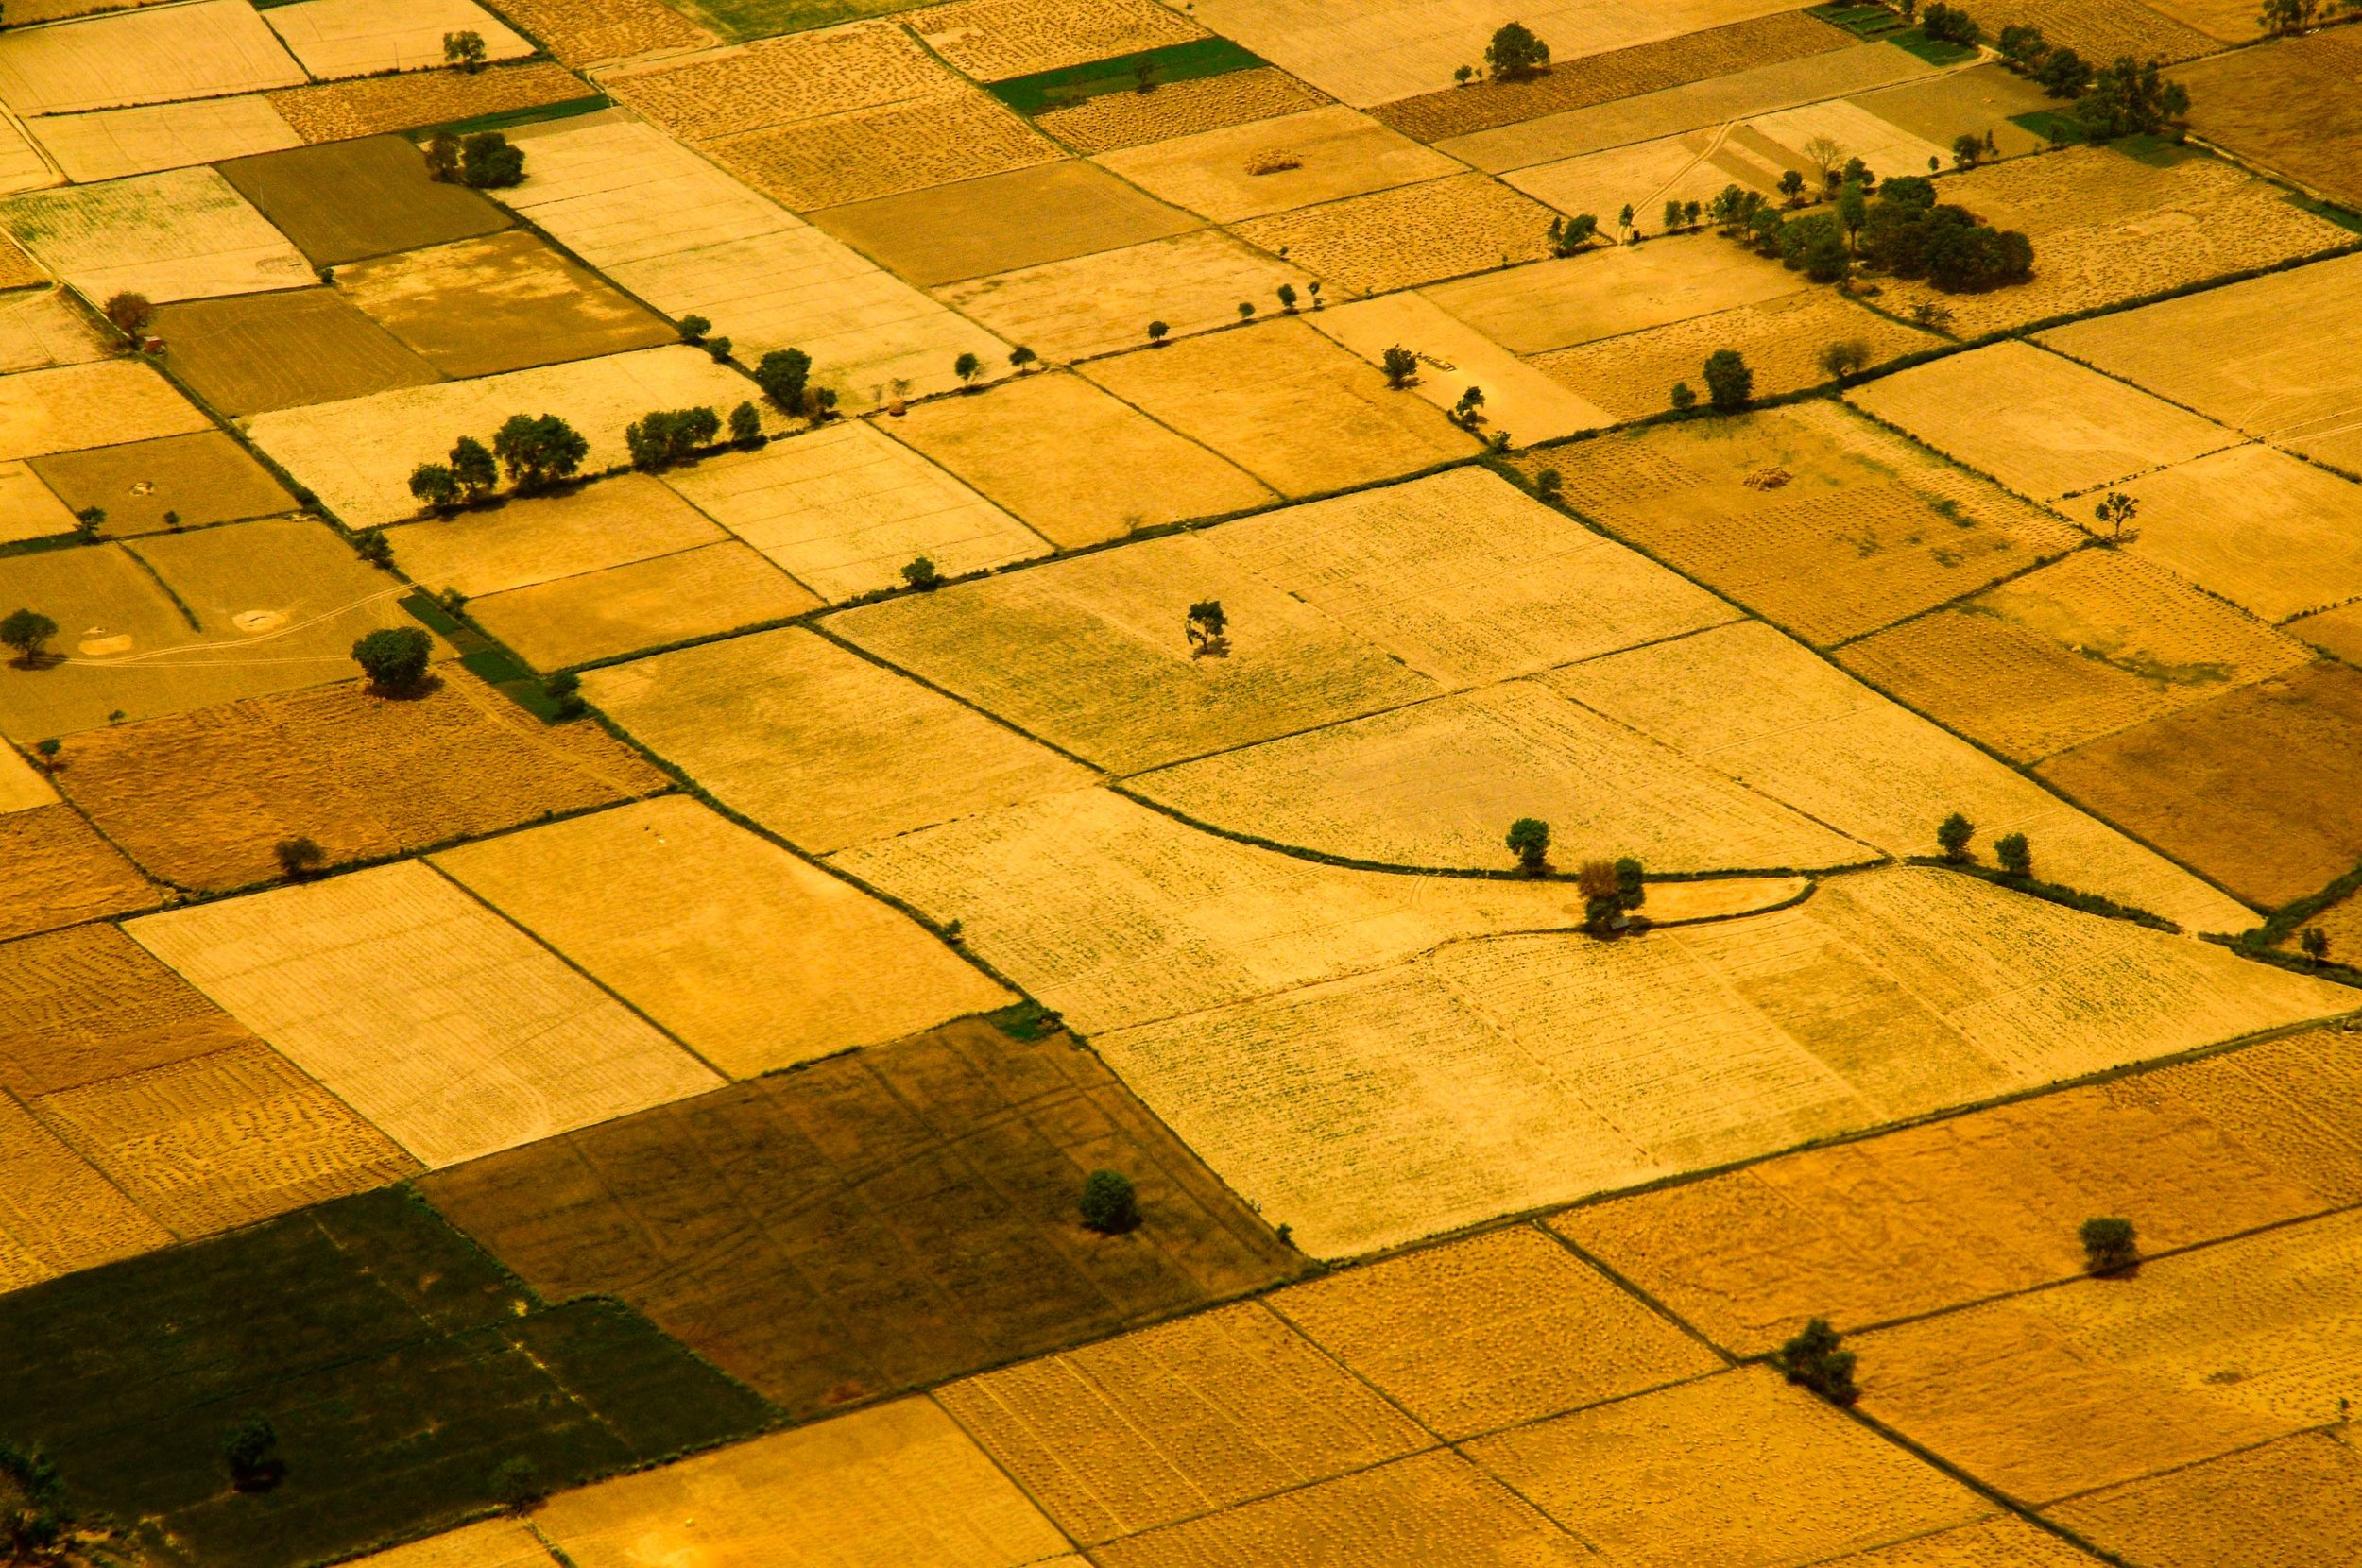 Golden Fields, Agra, India 2009